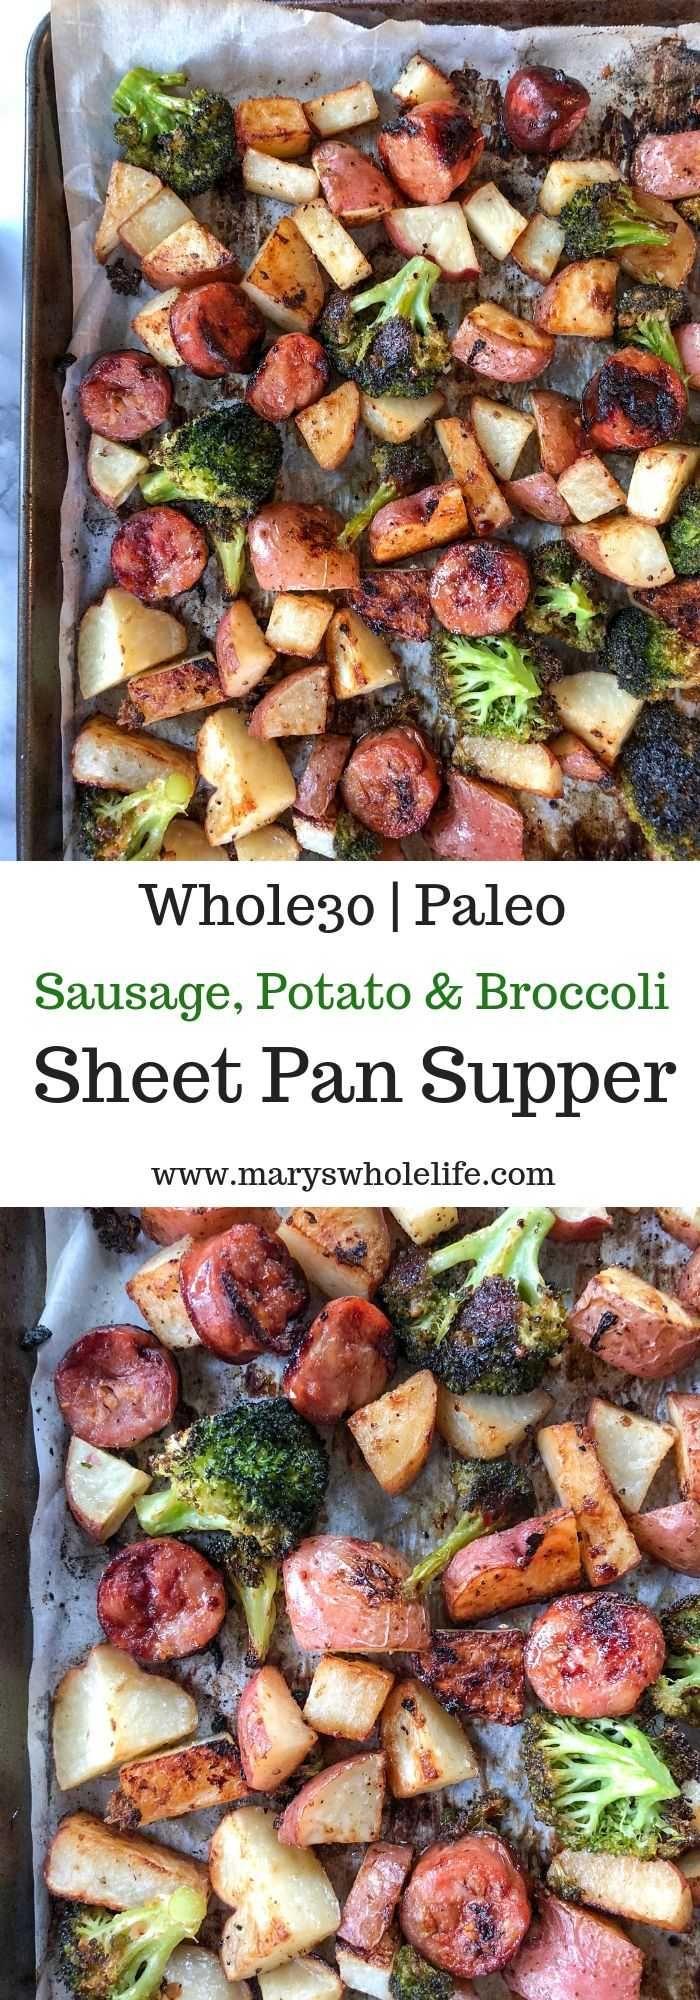 Sausage Potato  Broccoli Sheet Pan Supper